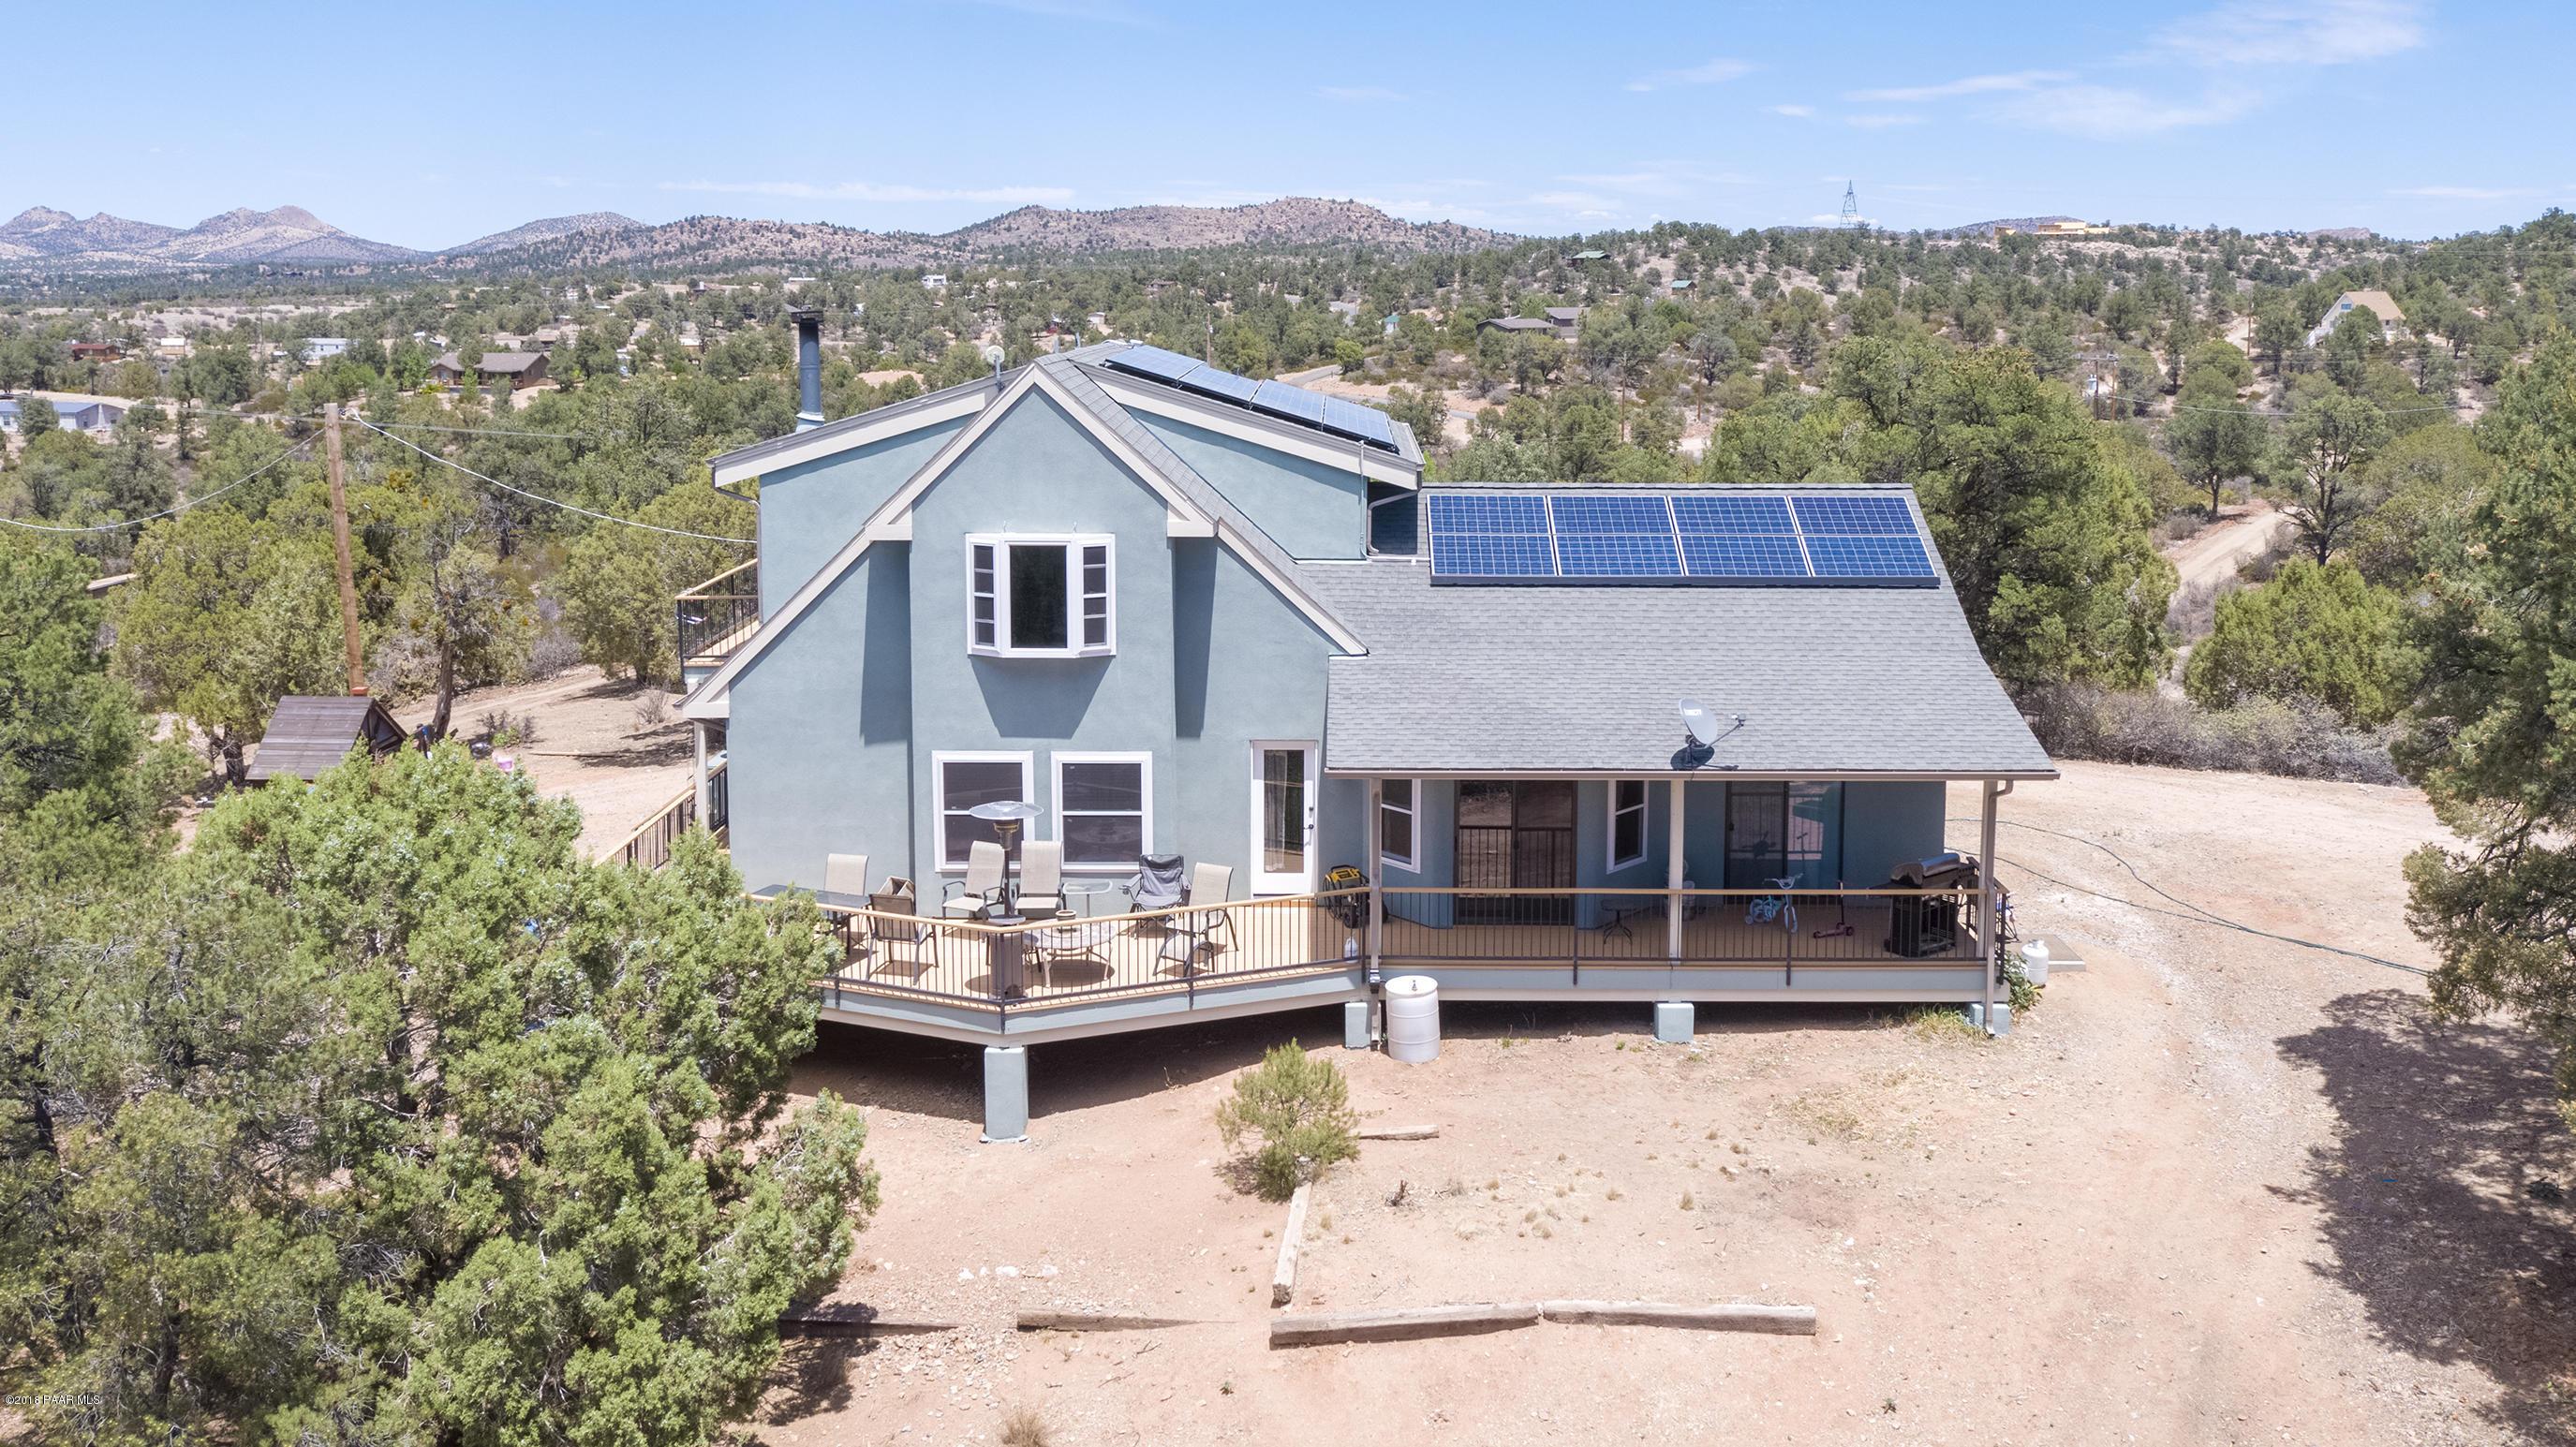 14800 N Deerview Trail Prescott, AZ 86305 - MLS #: 1012313